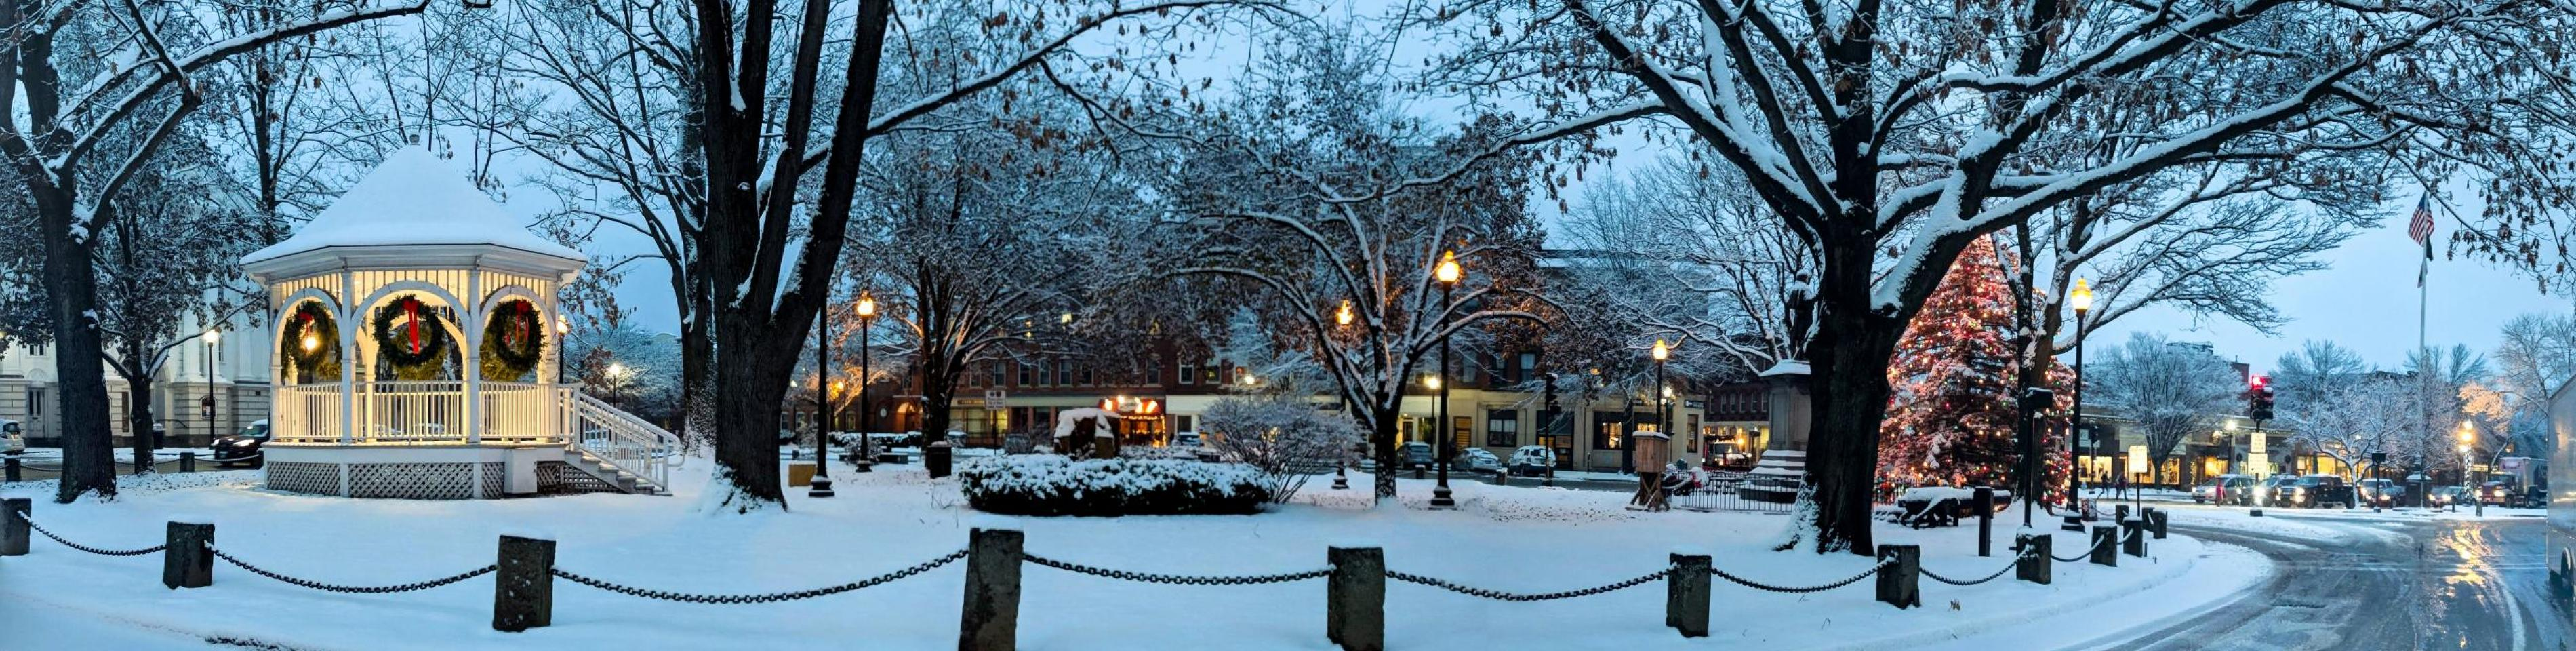 snowy keene center